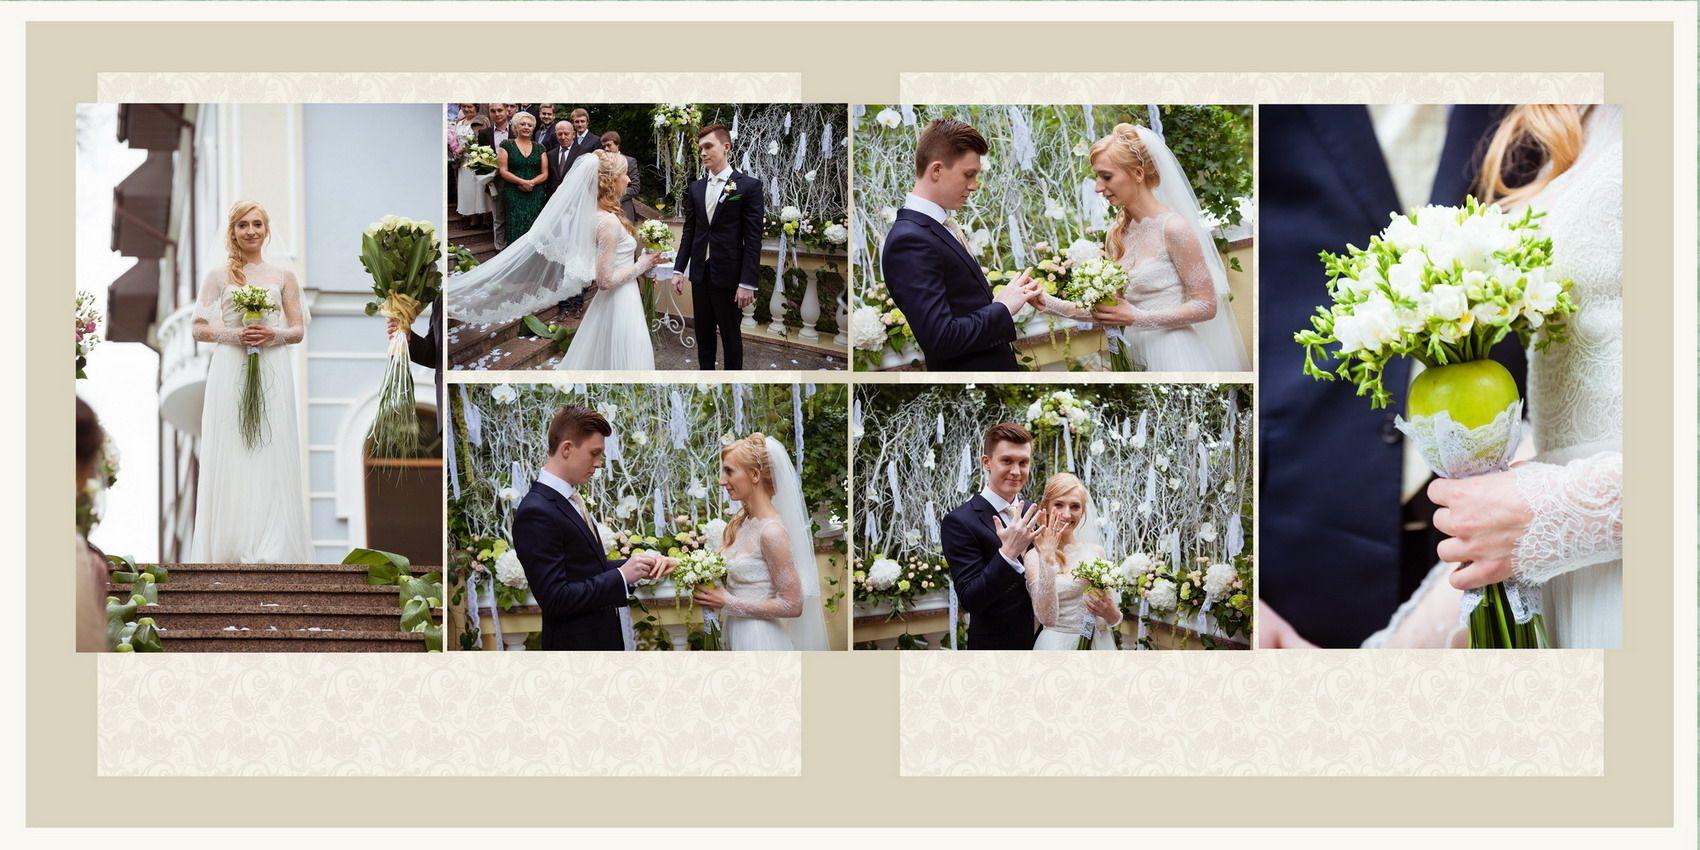 Apple wedding http://fotostudio.com.ua/my_portfolio/apple_wedding  Wedding photographer Dmytriy Bartosh, Kyiv, Ukraine Свадебный фотограф Дмитрий Бартош, Киев, Украина